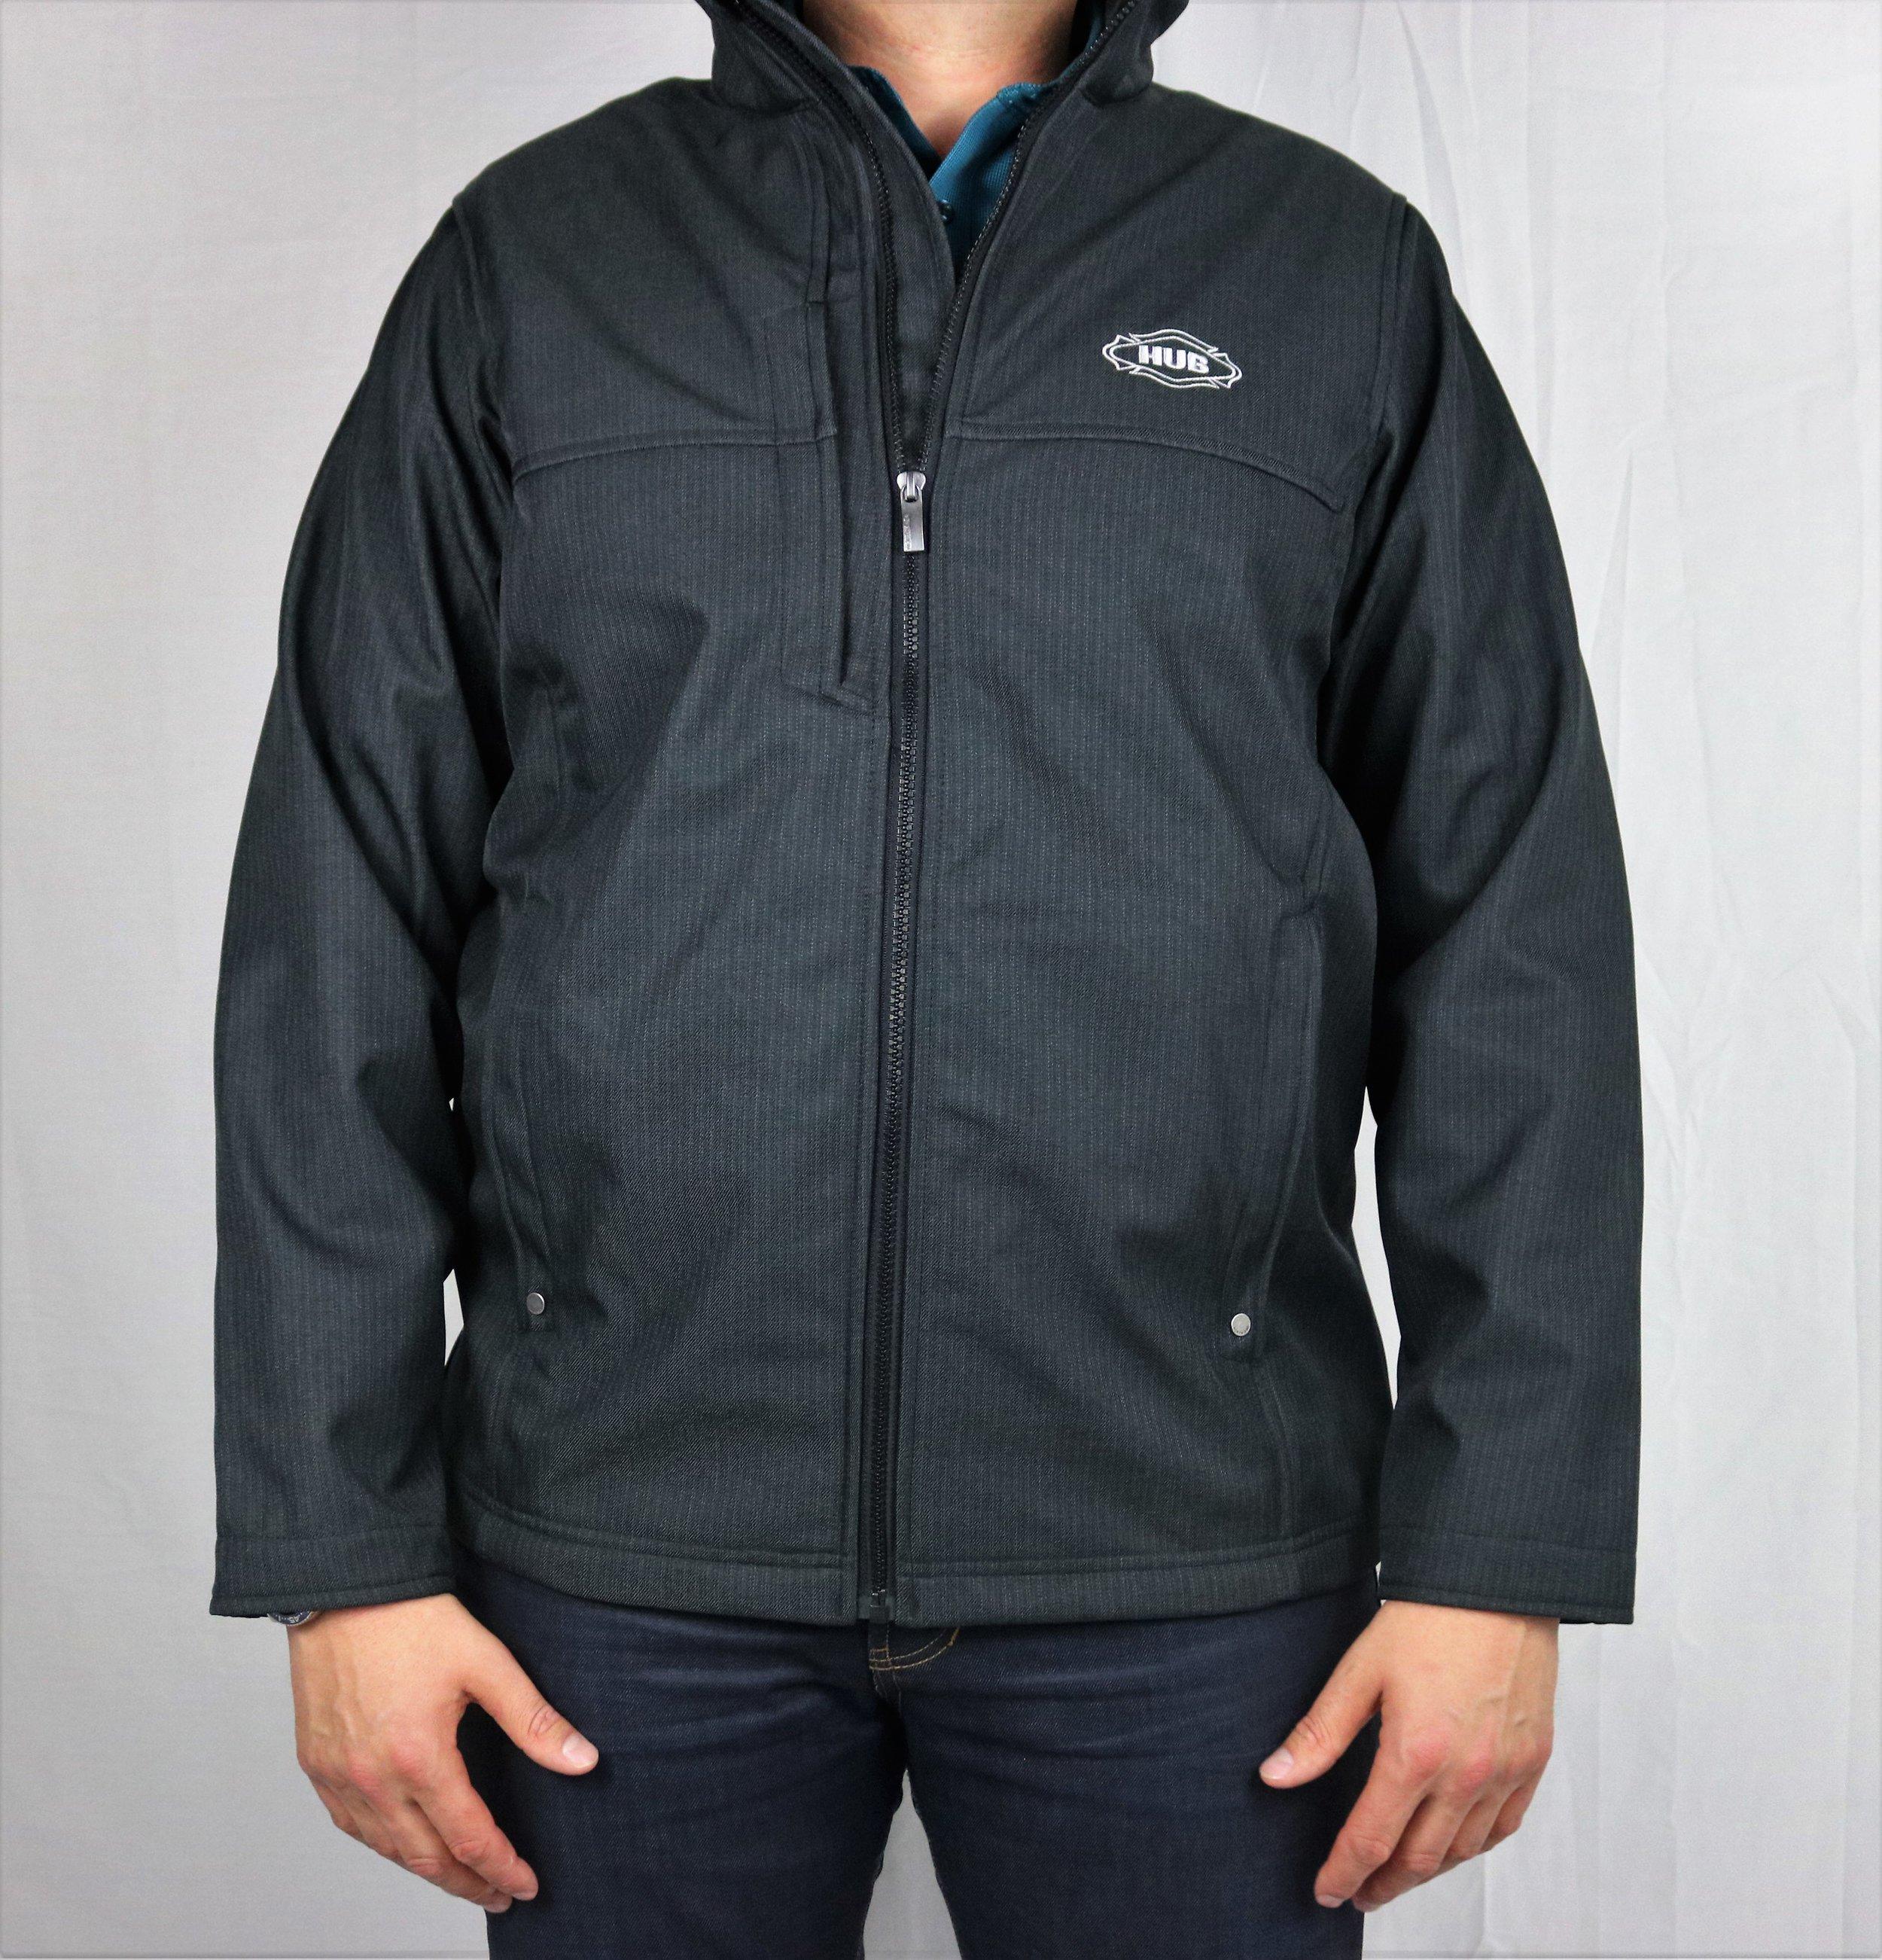 HUB Softshell Jacket  |  $125